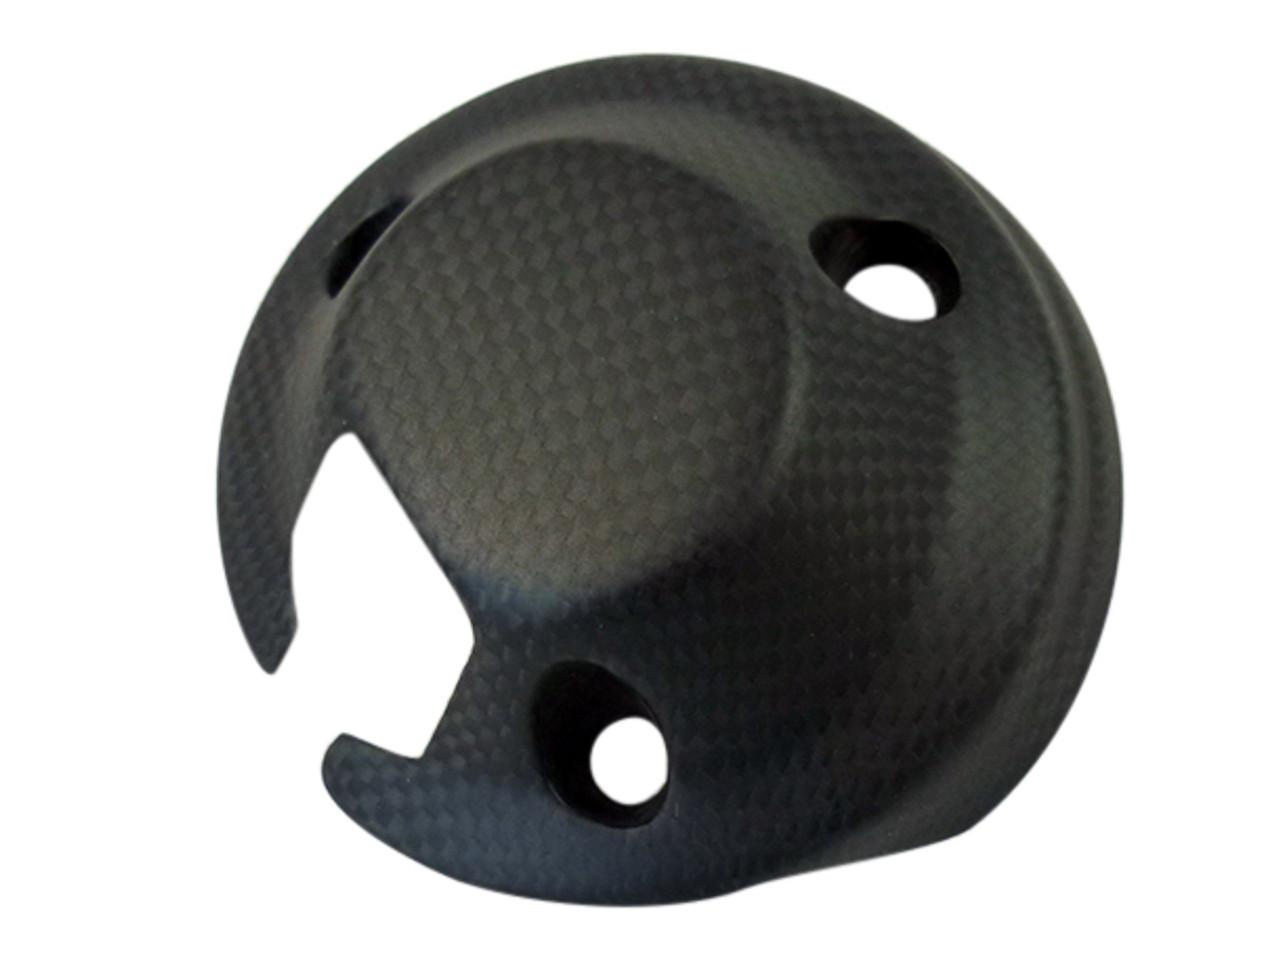 Cockpit Cover in Matte Plain Weave Carbon Fiber for Ducati Scrambler